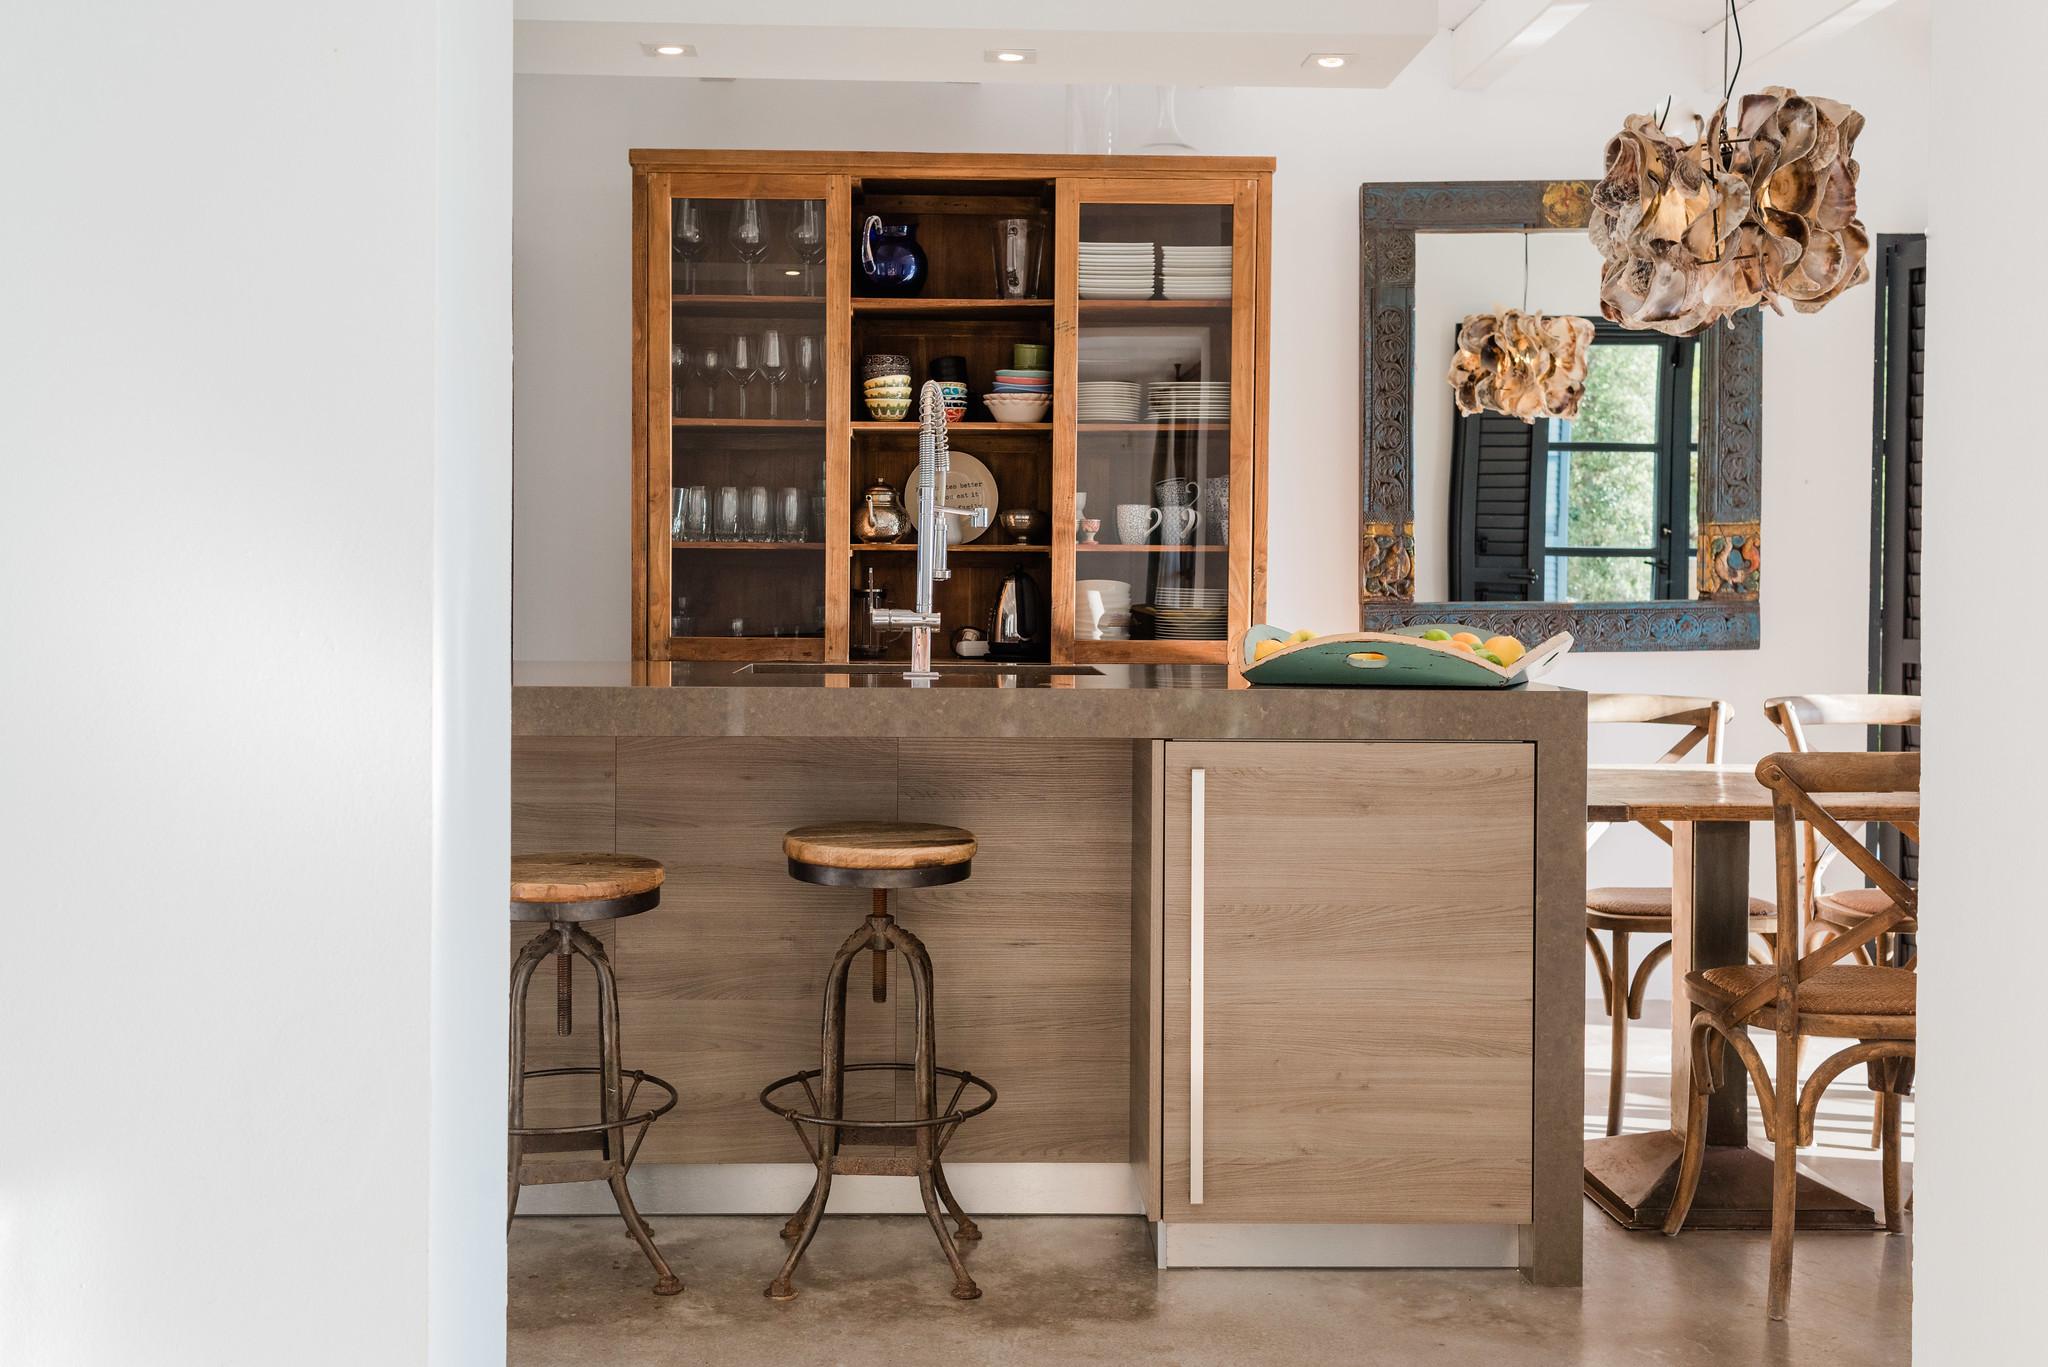 https://www.white-ibiza.com/wp-content/uploads/2020/05/white-ibiza-villas-casa-amalia-interior-view-into-kitchen.jpg